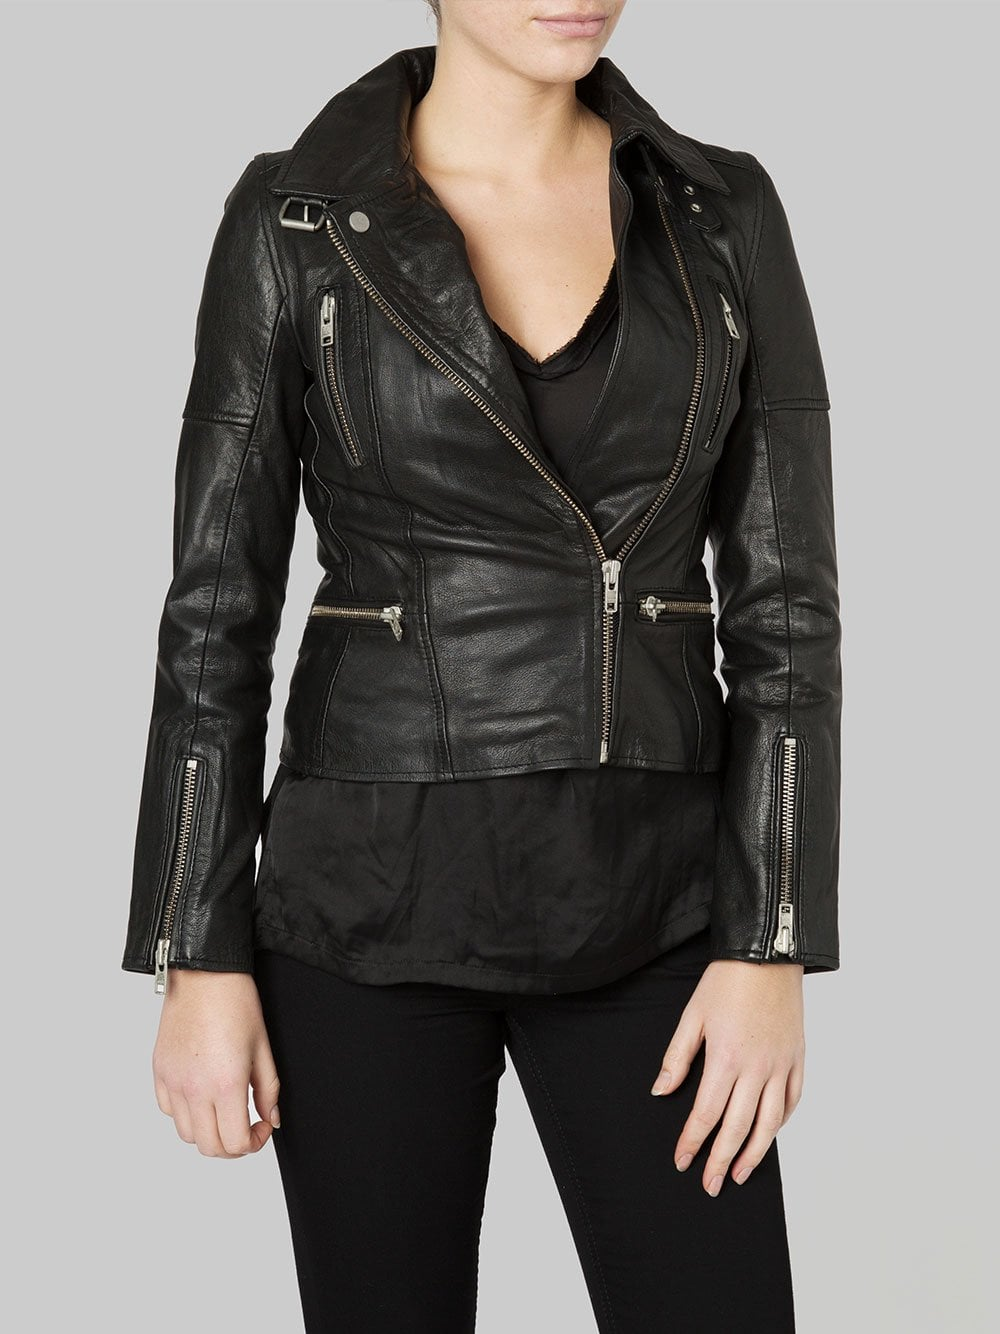 c4651a552bea Nobel Black Leather Biker Jacket - SHOP WOMEN from Muubaa UK